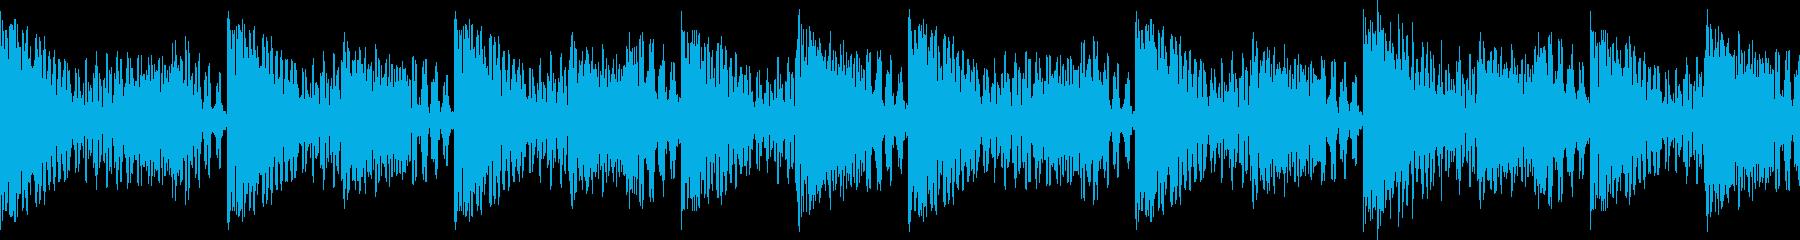 BPM128EDMリズムループキーF# の再生済みの波形